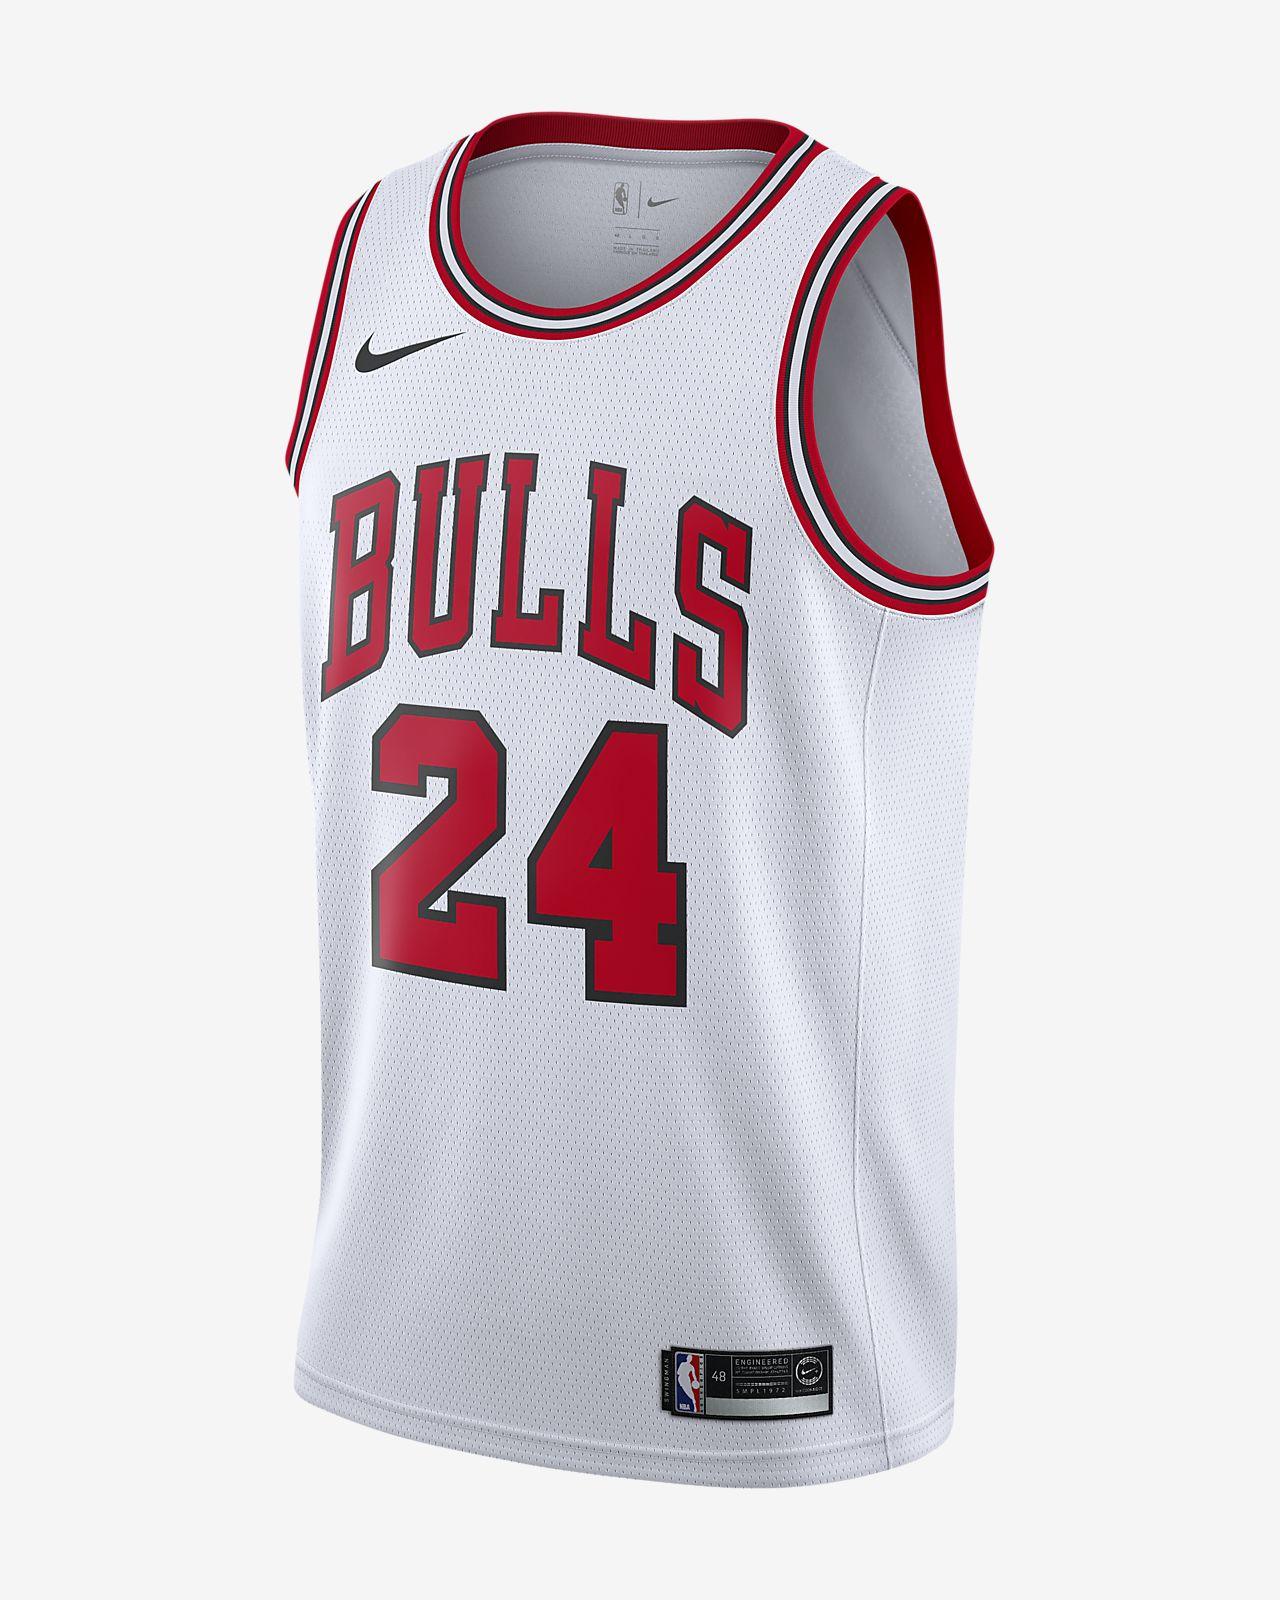 Maillot connecté Nike NBA Lauri Markkanen Association Edition Swingman (Chicago Bulls) pour Homme